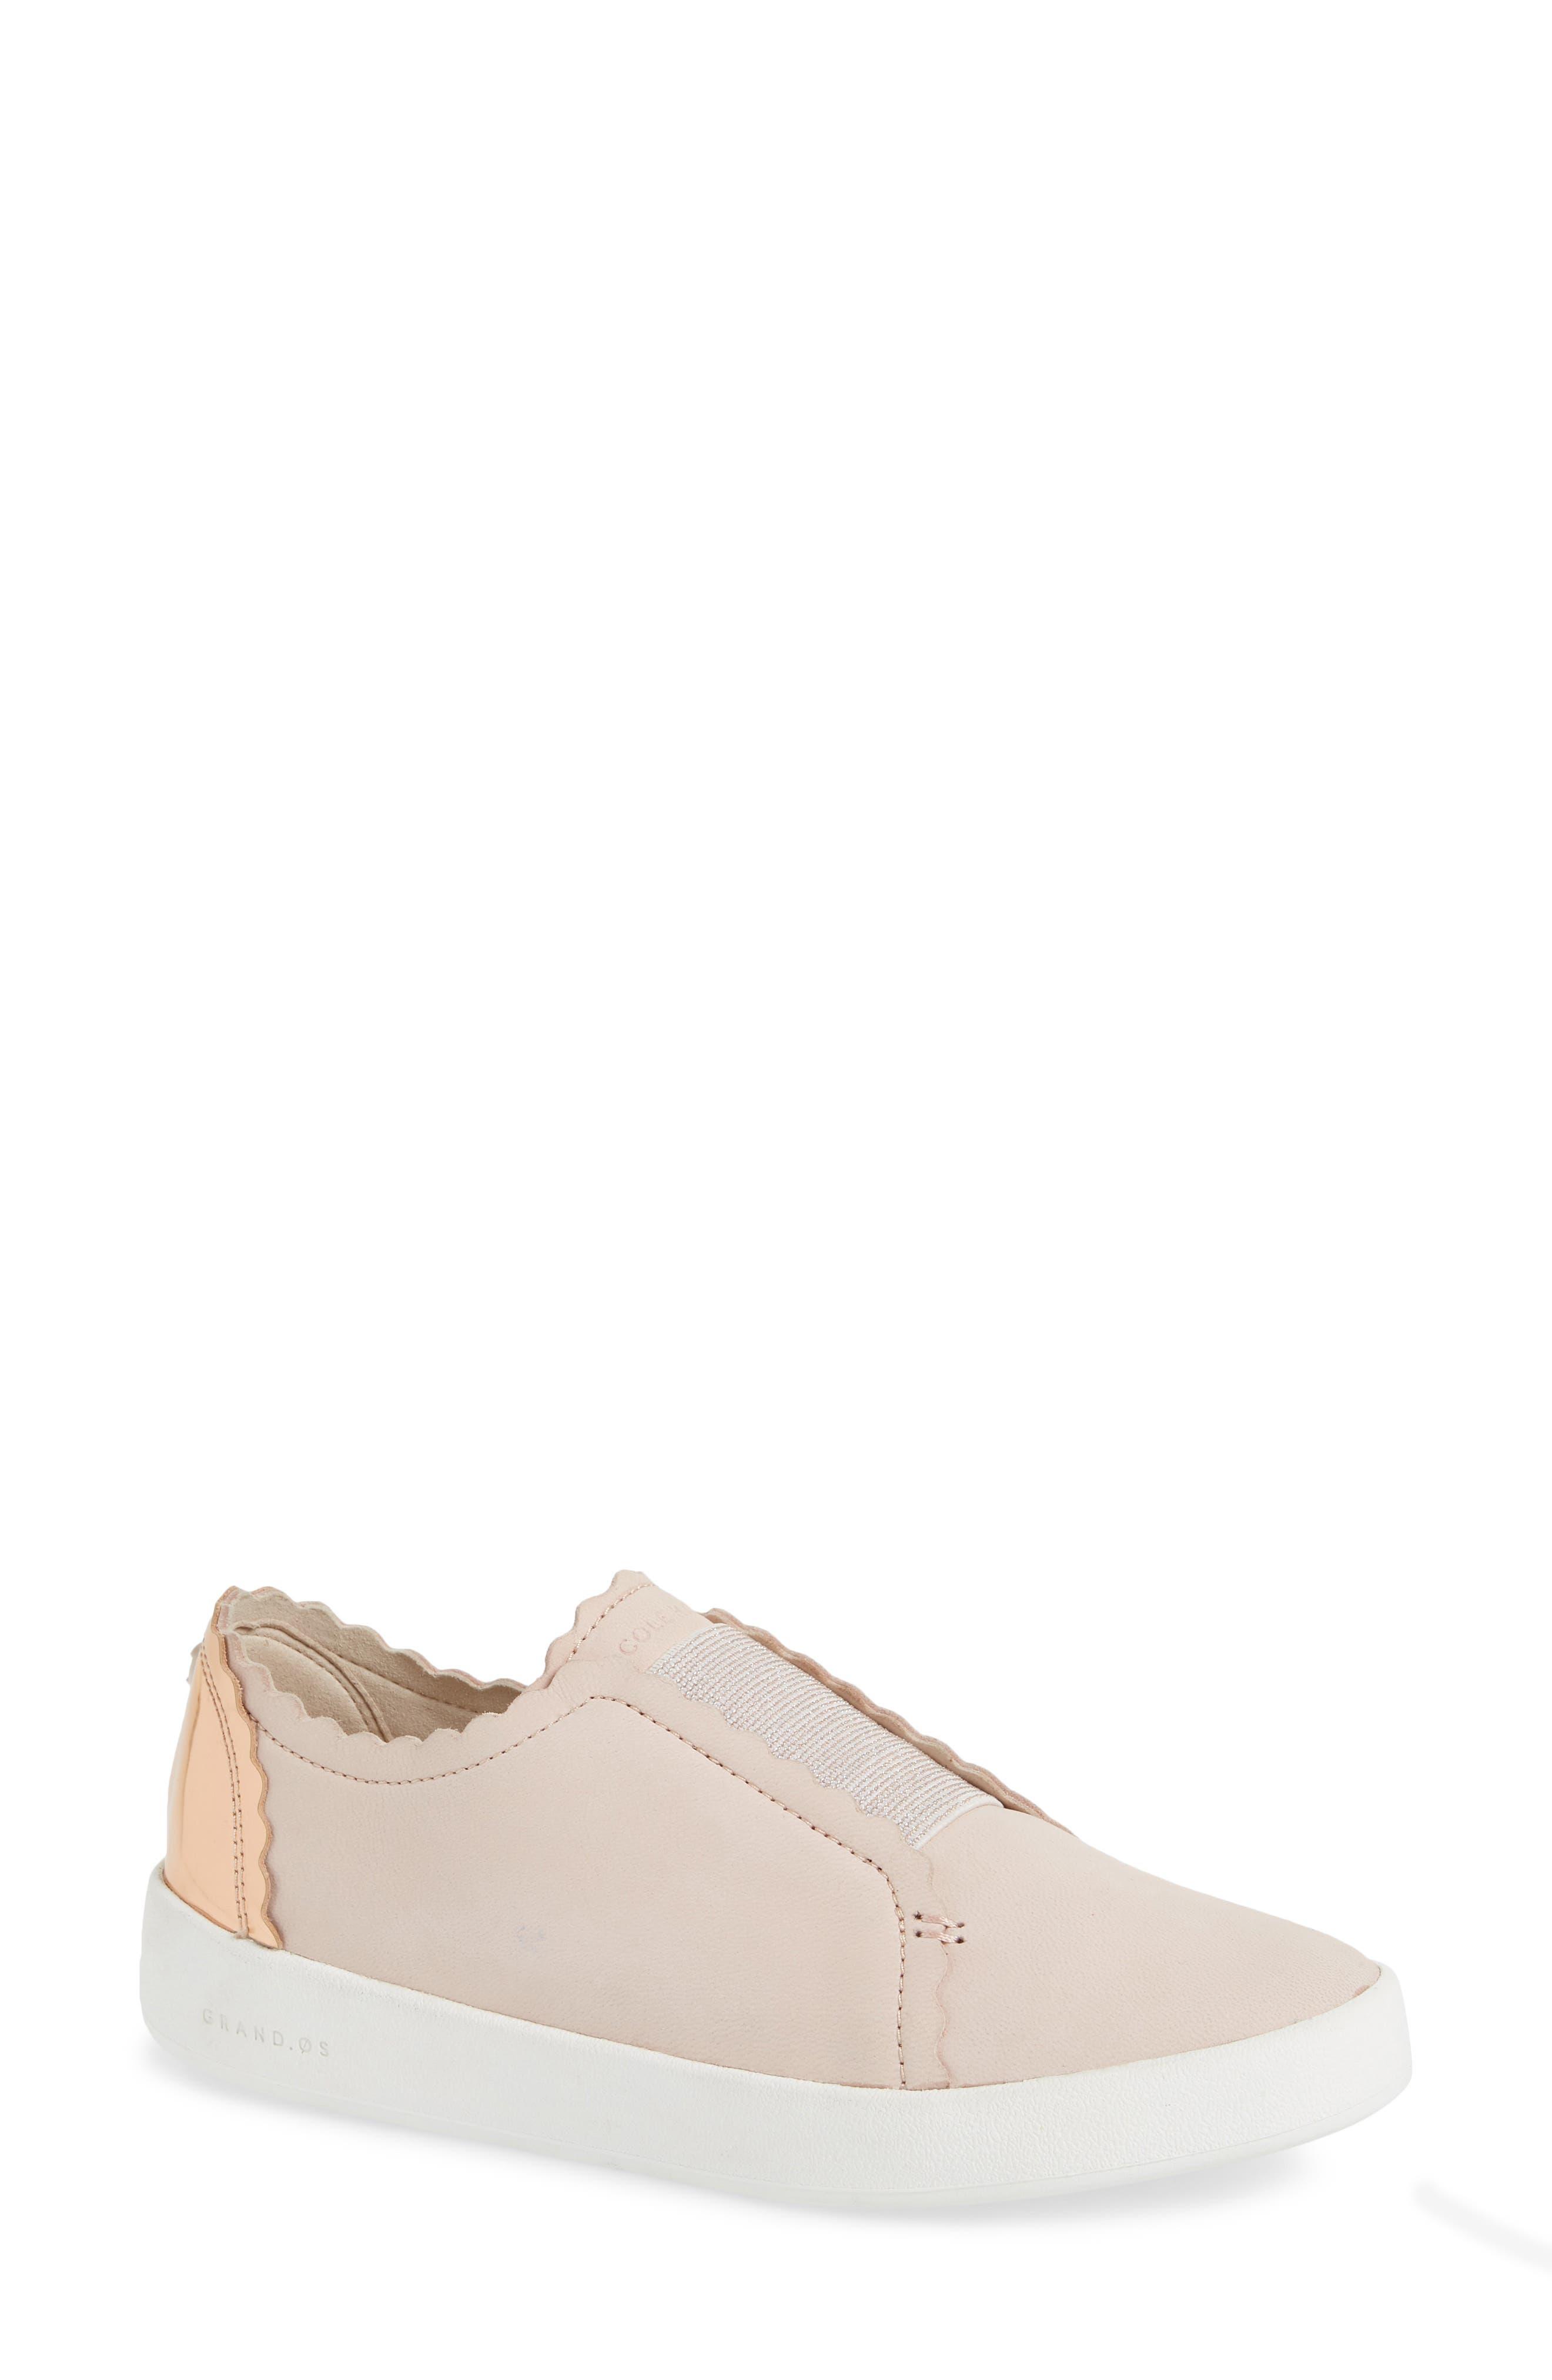 COLE HAAN, GrandPro Spectator Scalloped Slip-On Sneaker, Main thumbnail 1, color, PEACH BLUSH NUBUCK